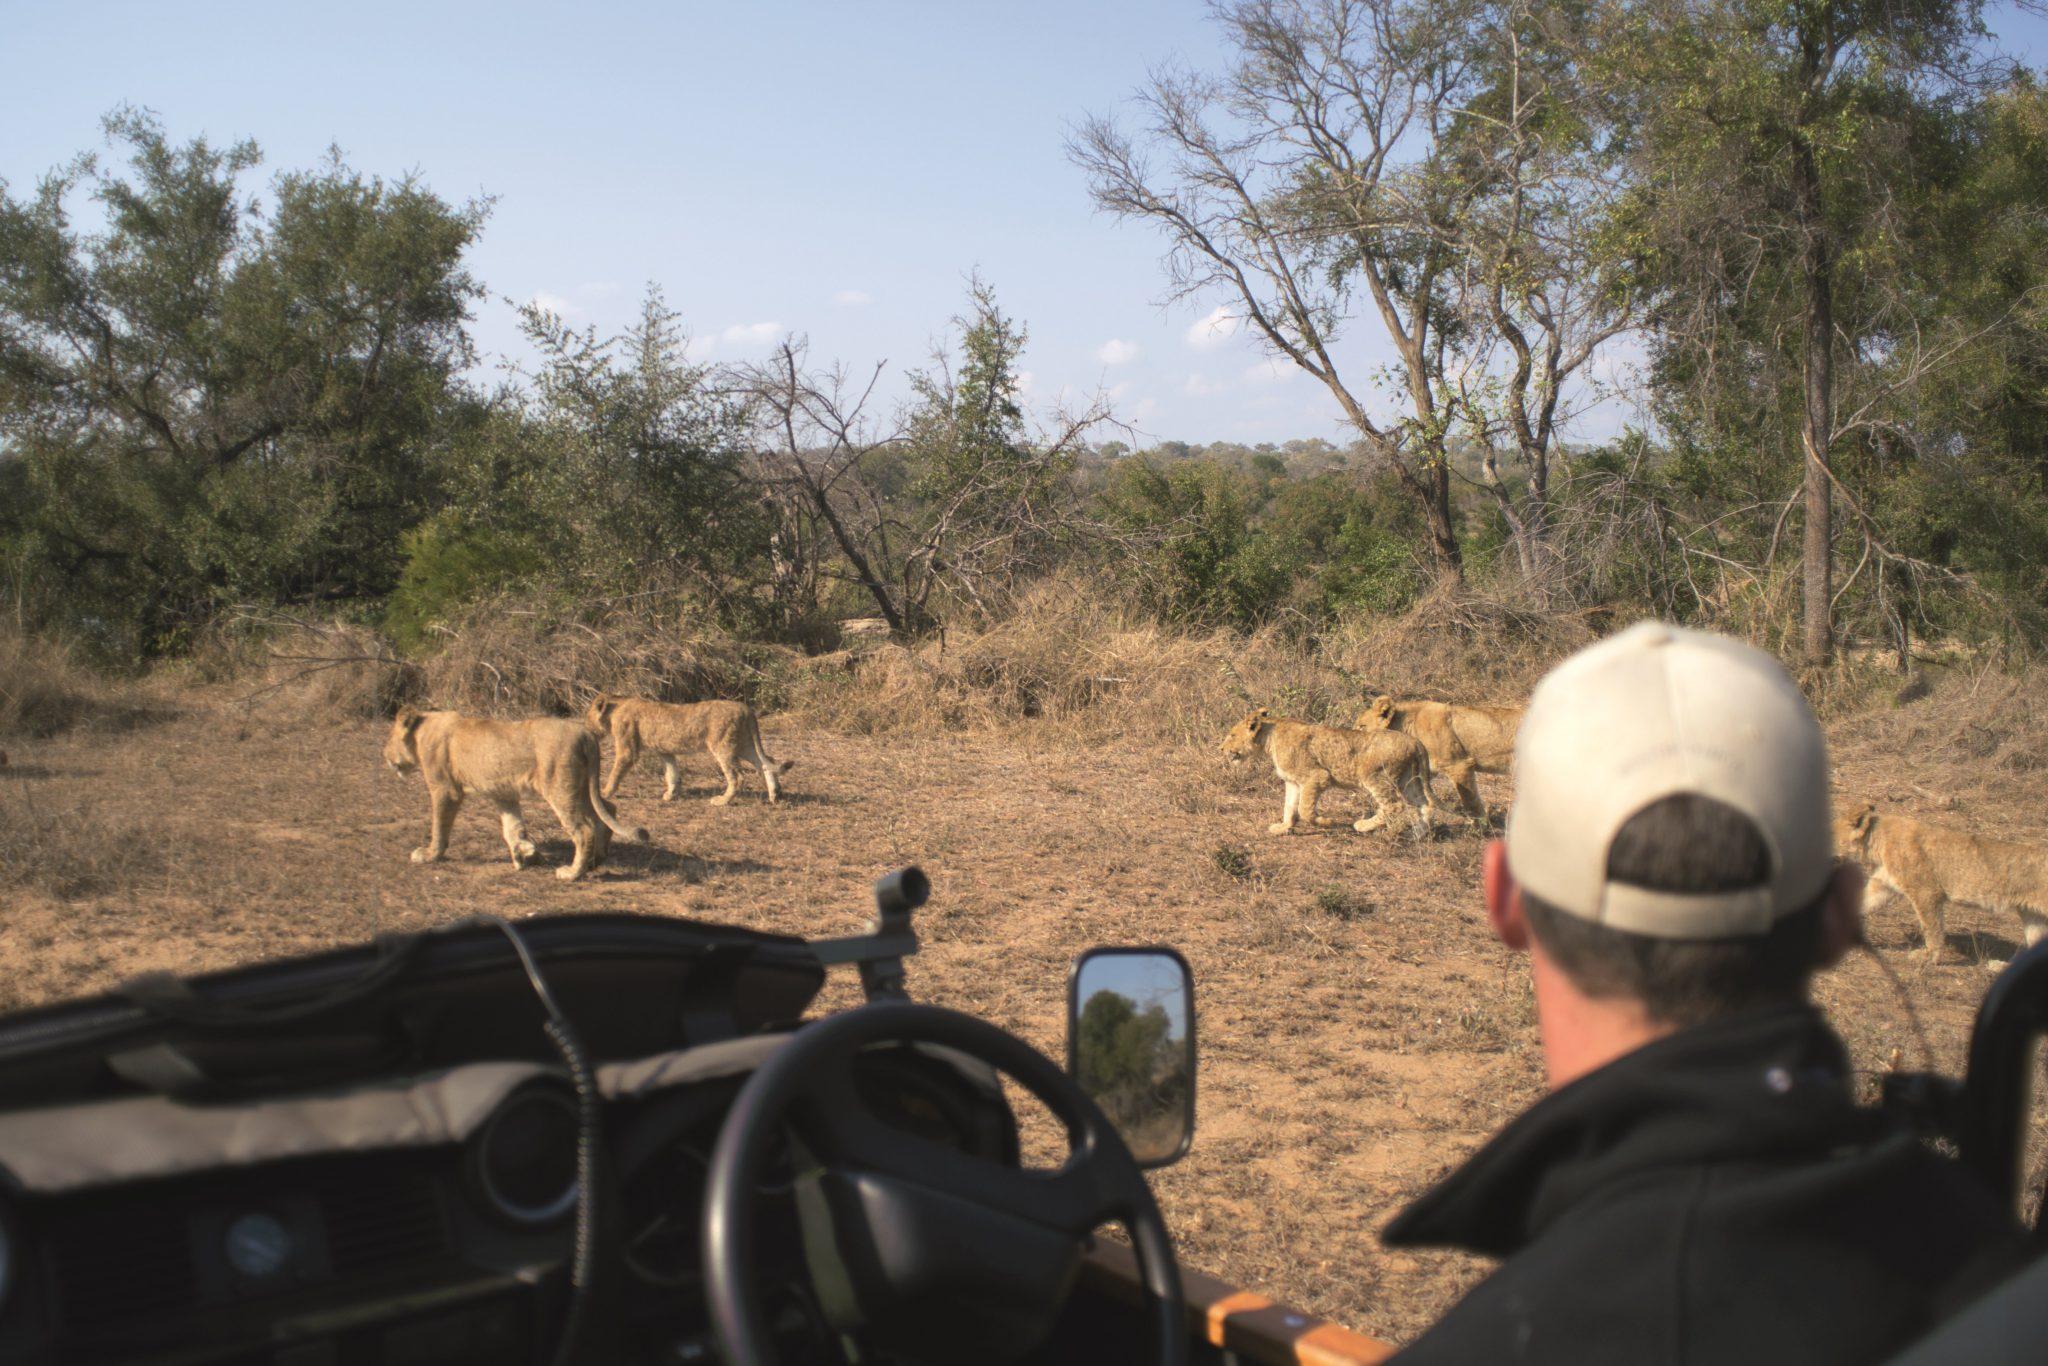 https://www.safariventures.com/wp-content/uploads/2019/11/SV5676.jpg